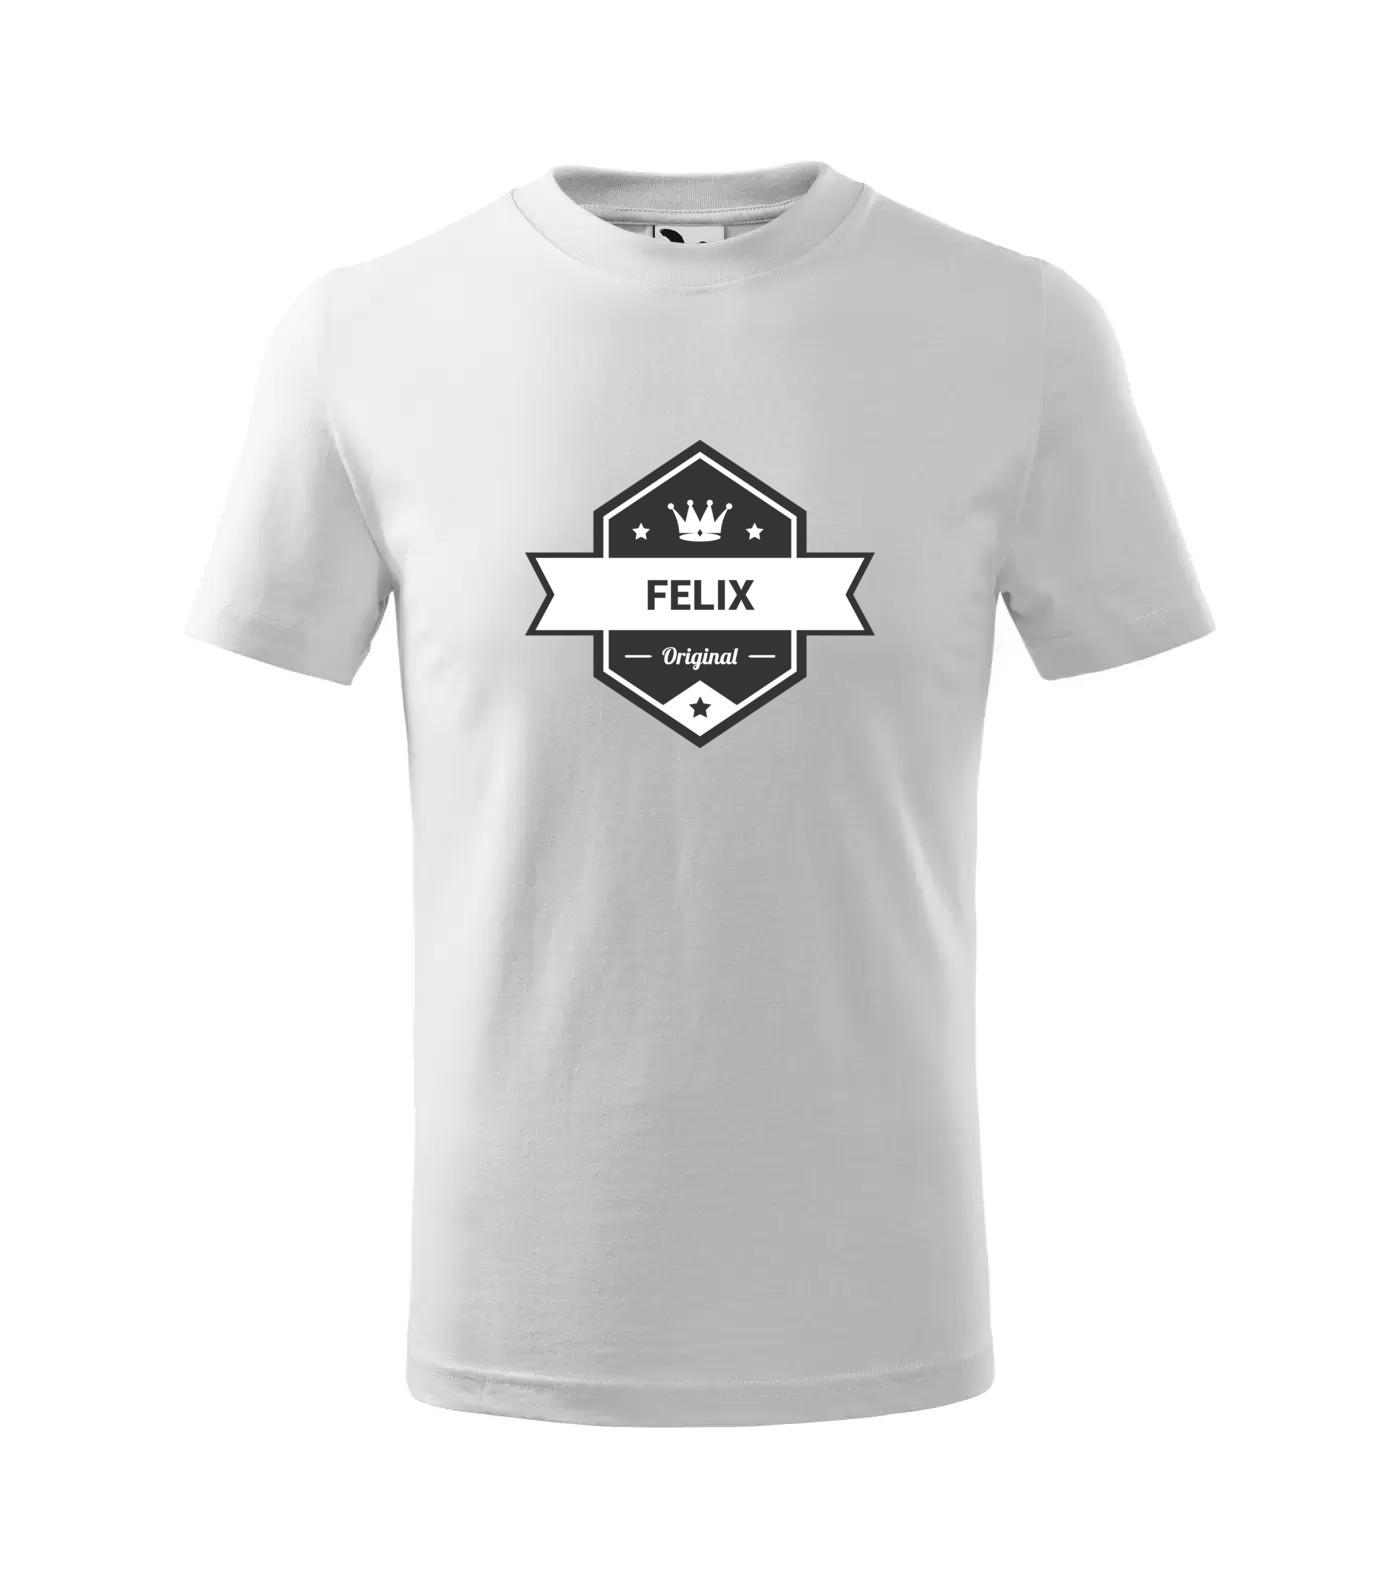 Tričko King Felix